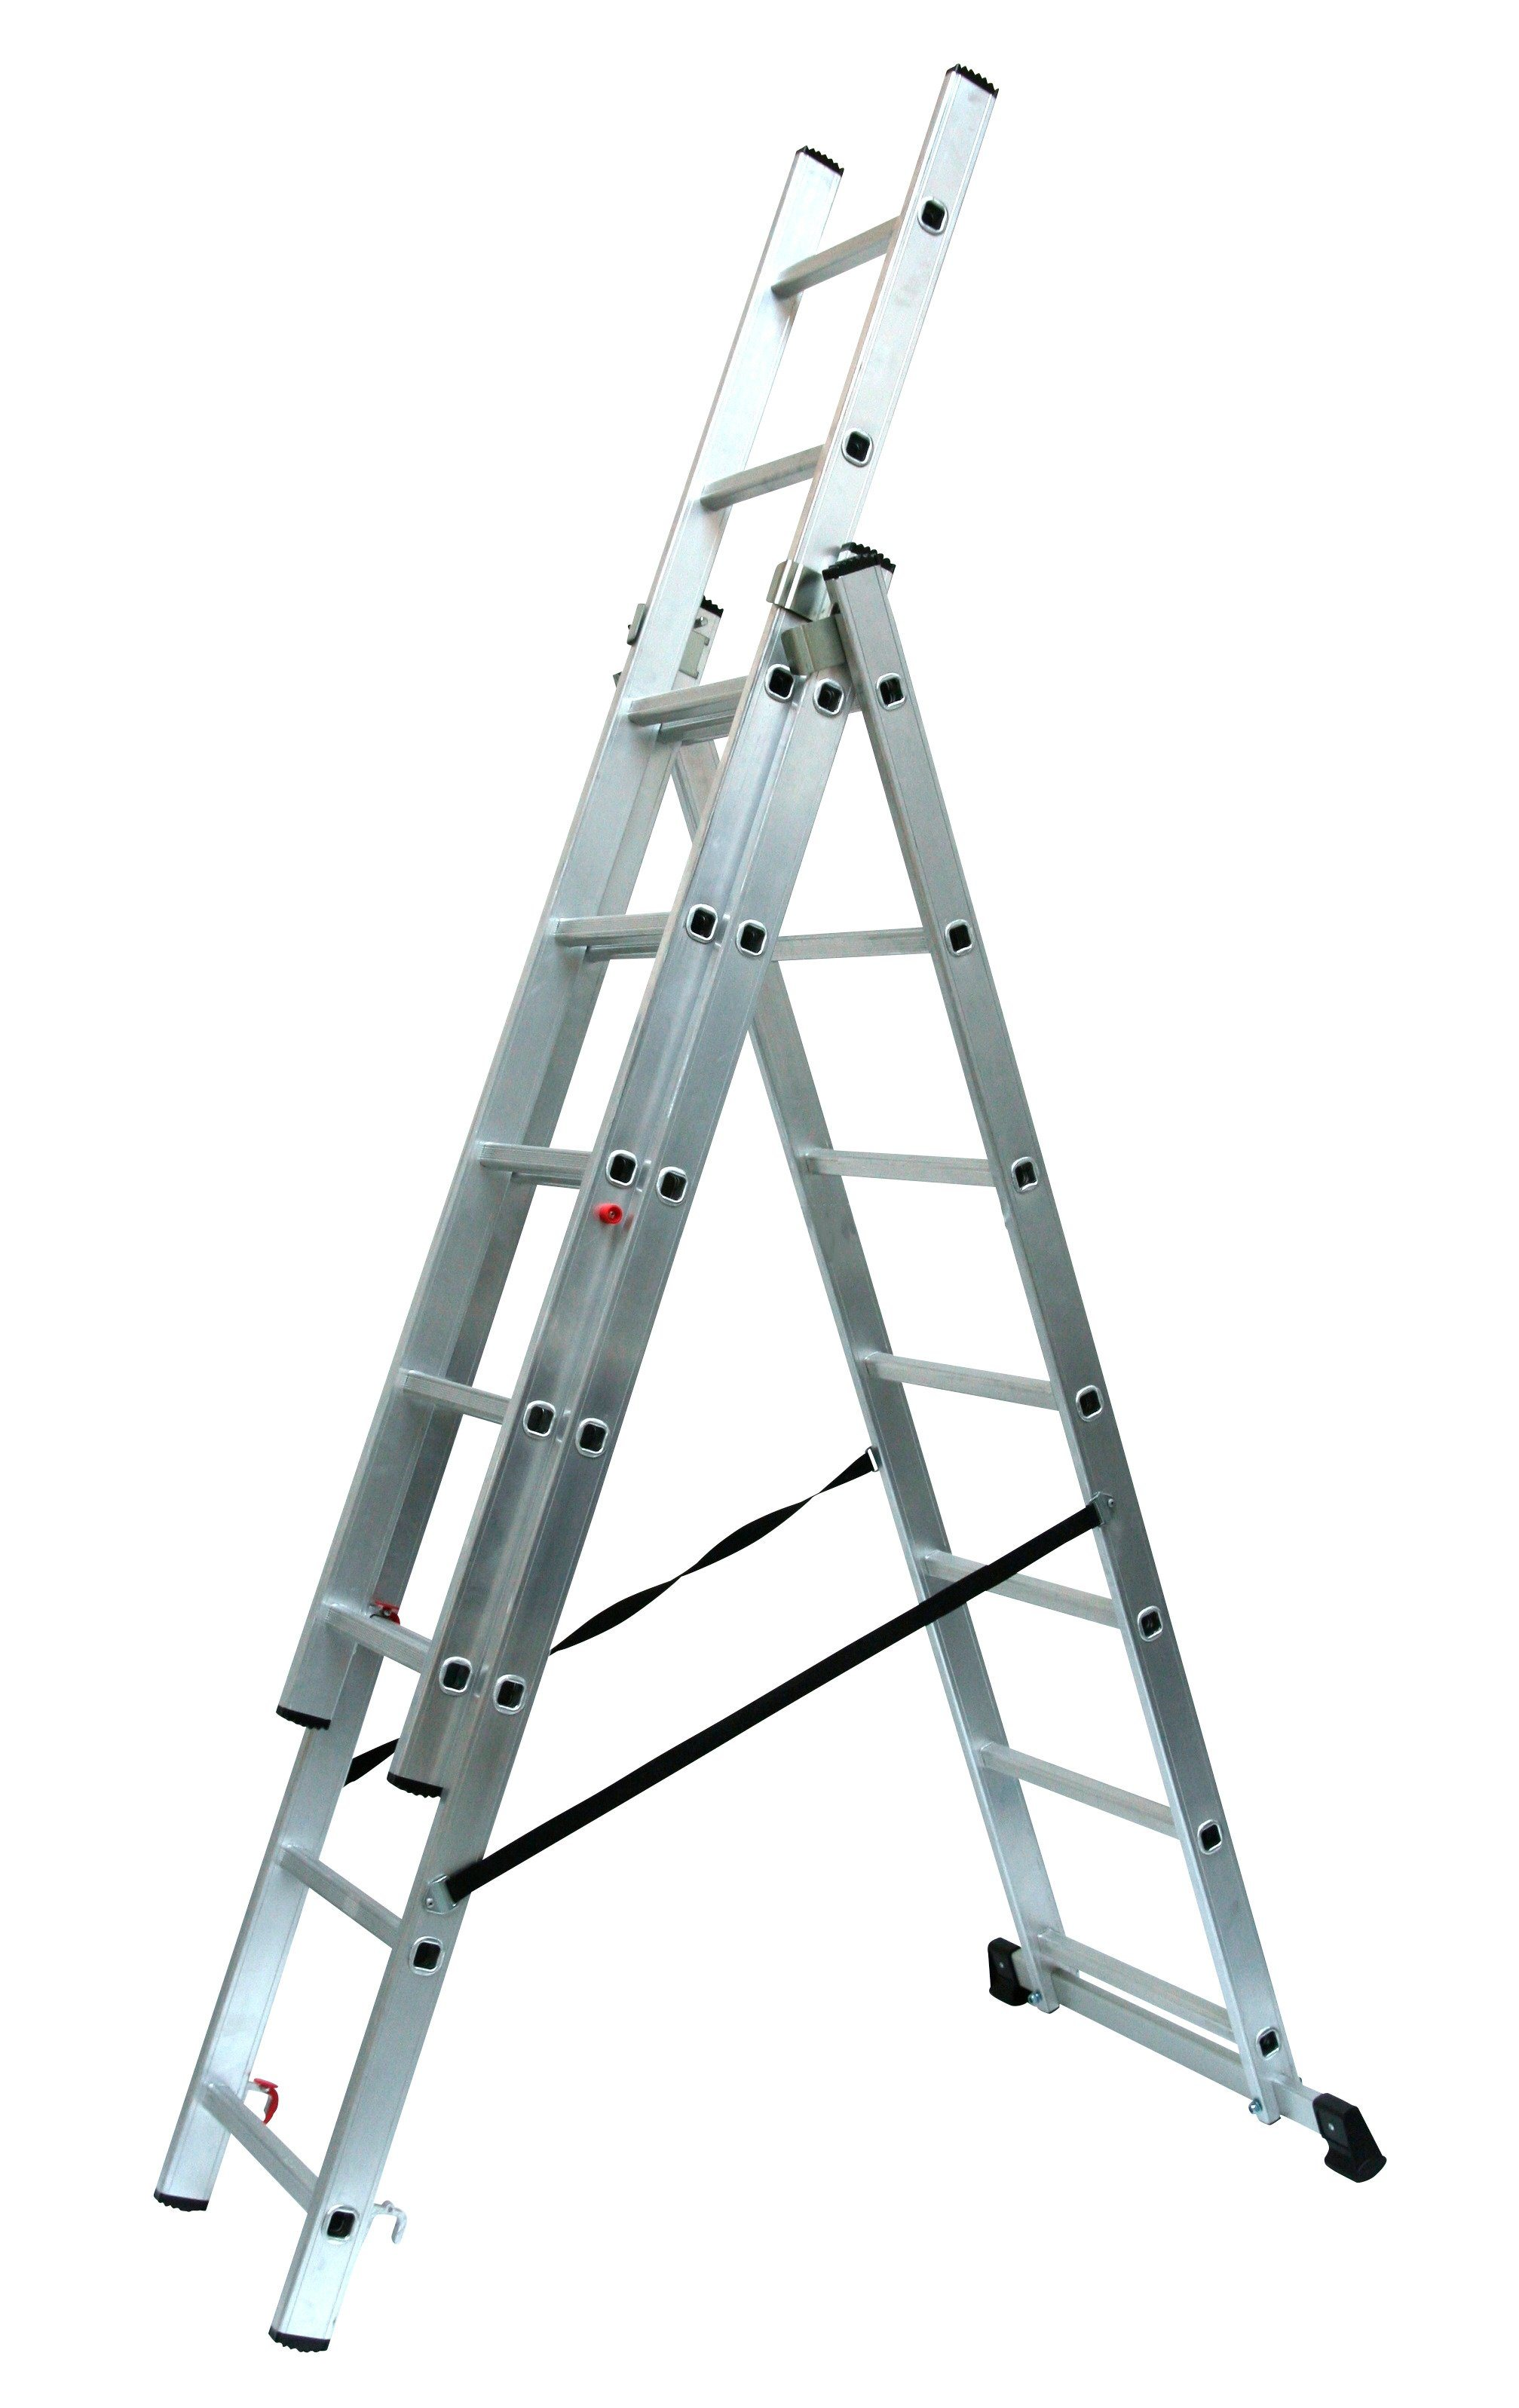 SZ METALL Alu-Schiebeleiter »7 x 3 Sprossen« | Baumarkt > Leitern und Treppen > Schiebeleiter | SZ Metall